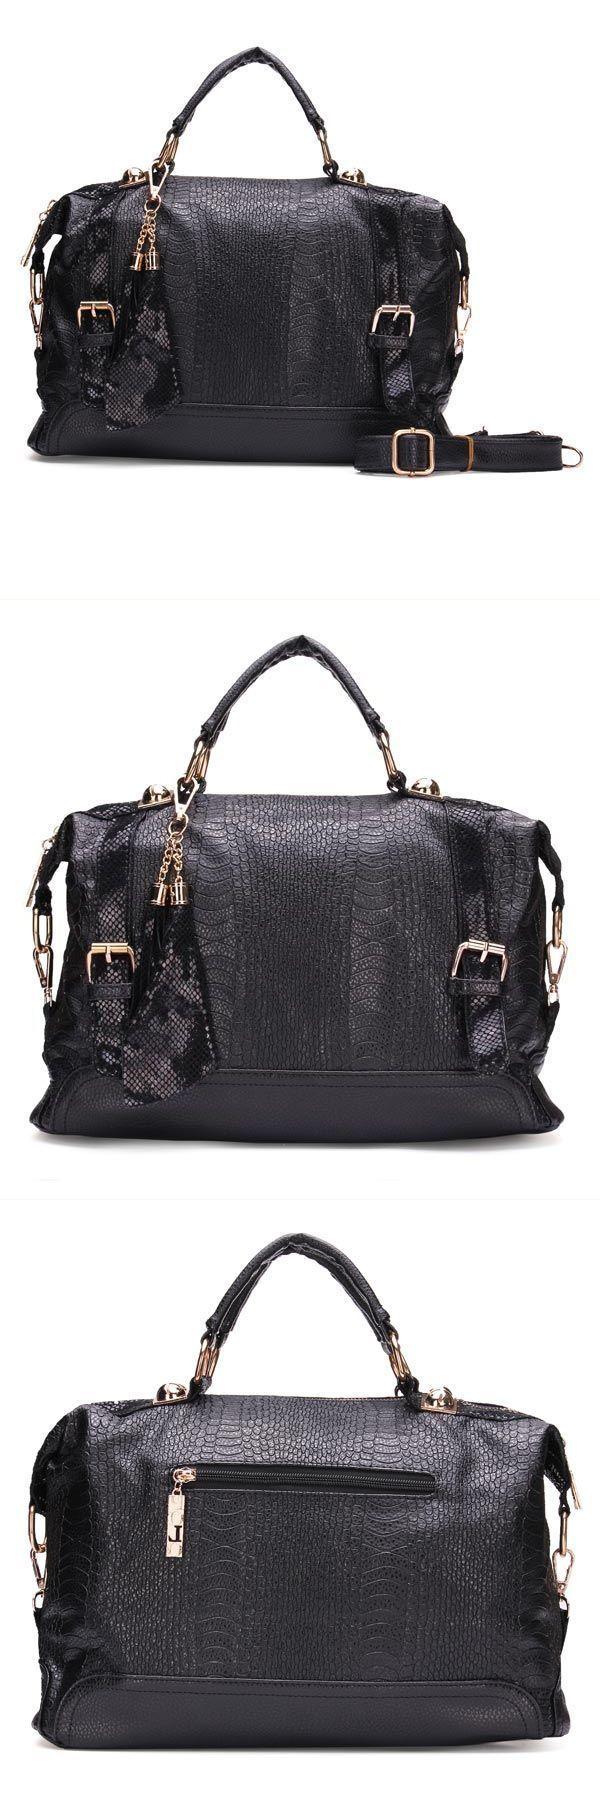 Fashion women snake print pattern tassel bag handbag shoulder bag zamp;l handbags #$6 #handbags #2 #zip #handbags #handbags #nordstrom #rack #handbags #trend #2018